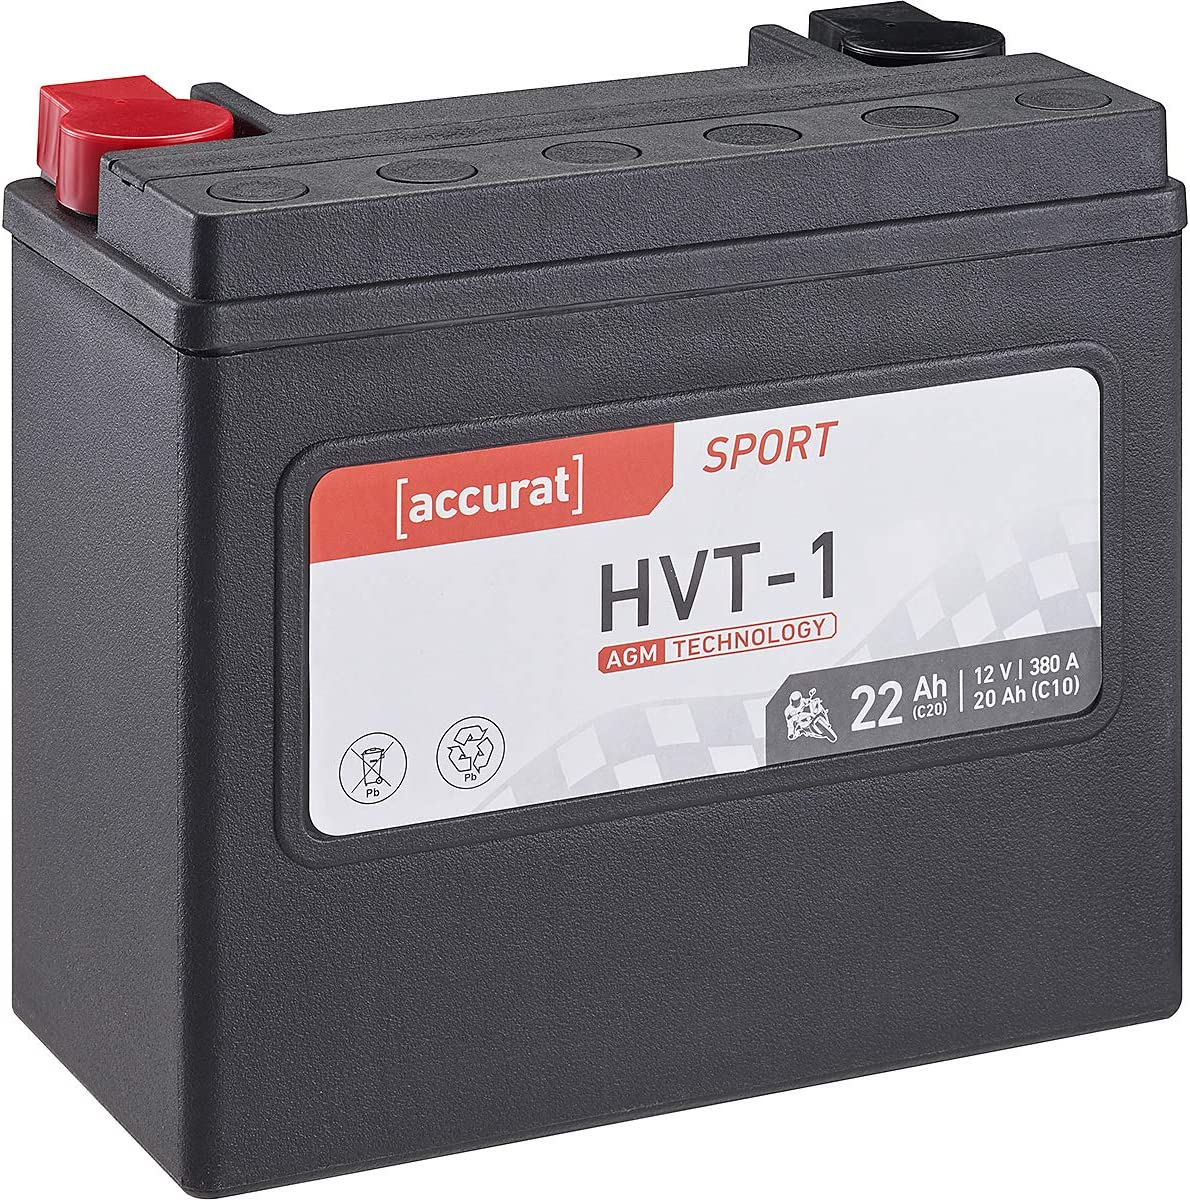 YTX14L-BS Accurat Motorrad-Batterie HVT-3 16Ah 12V 240A AGM SLA Starterbatterie wartungsfrei